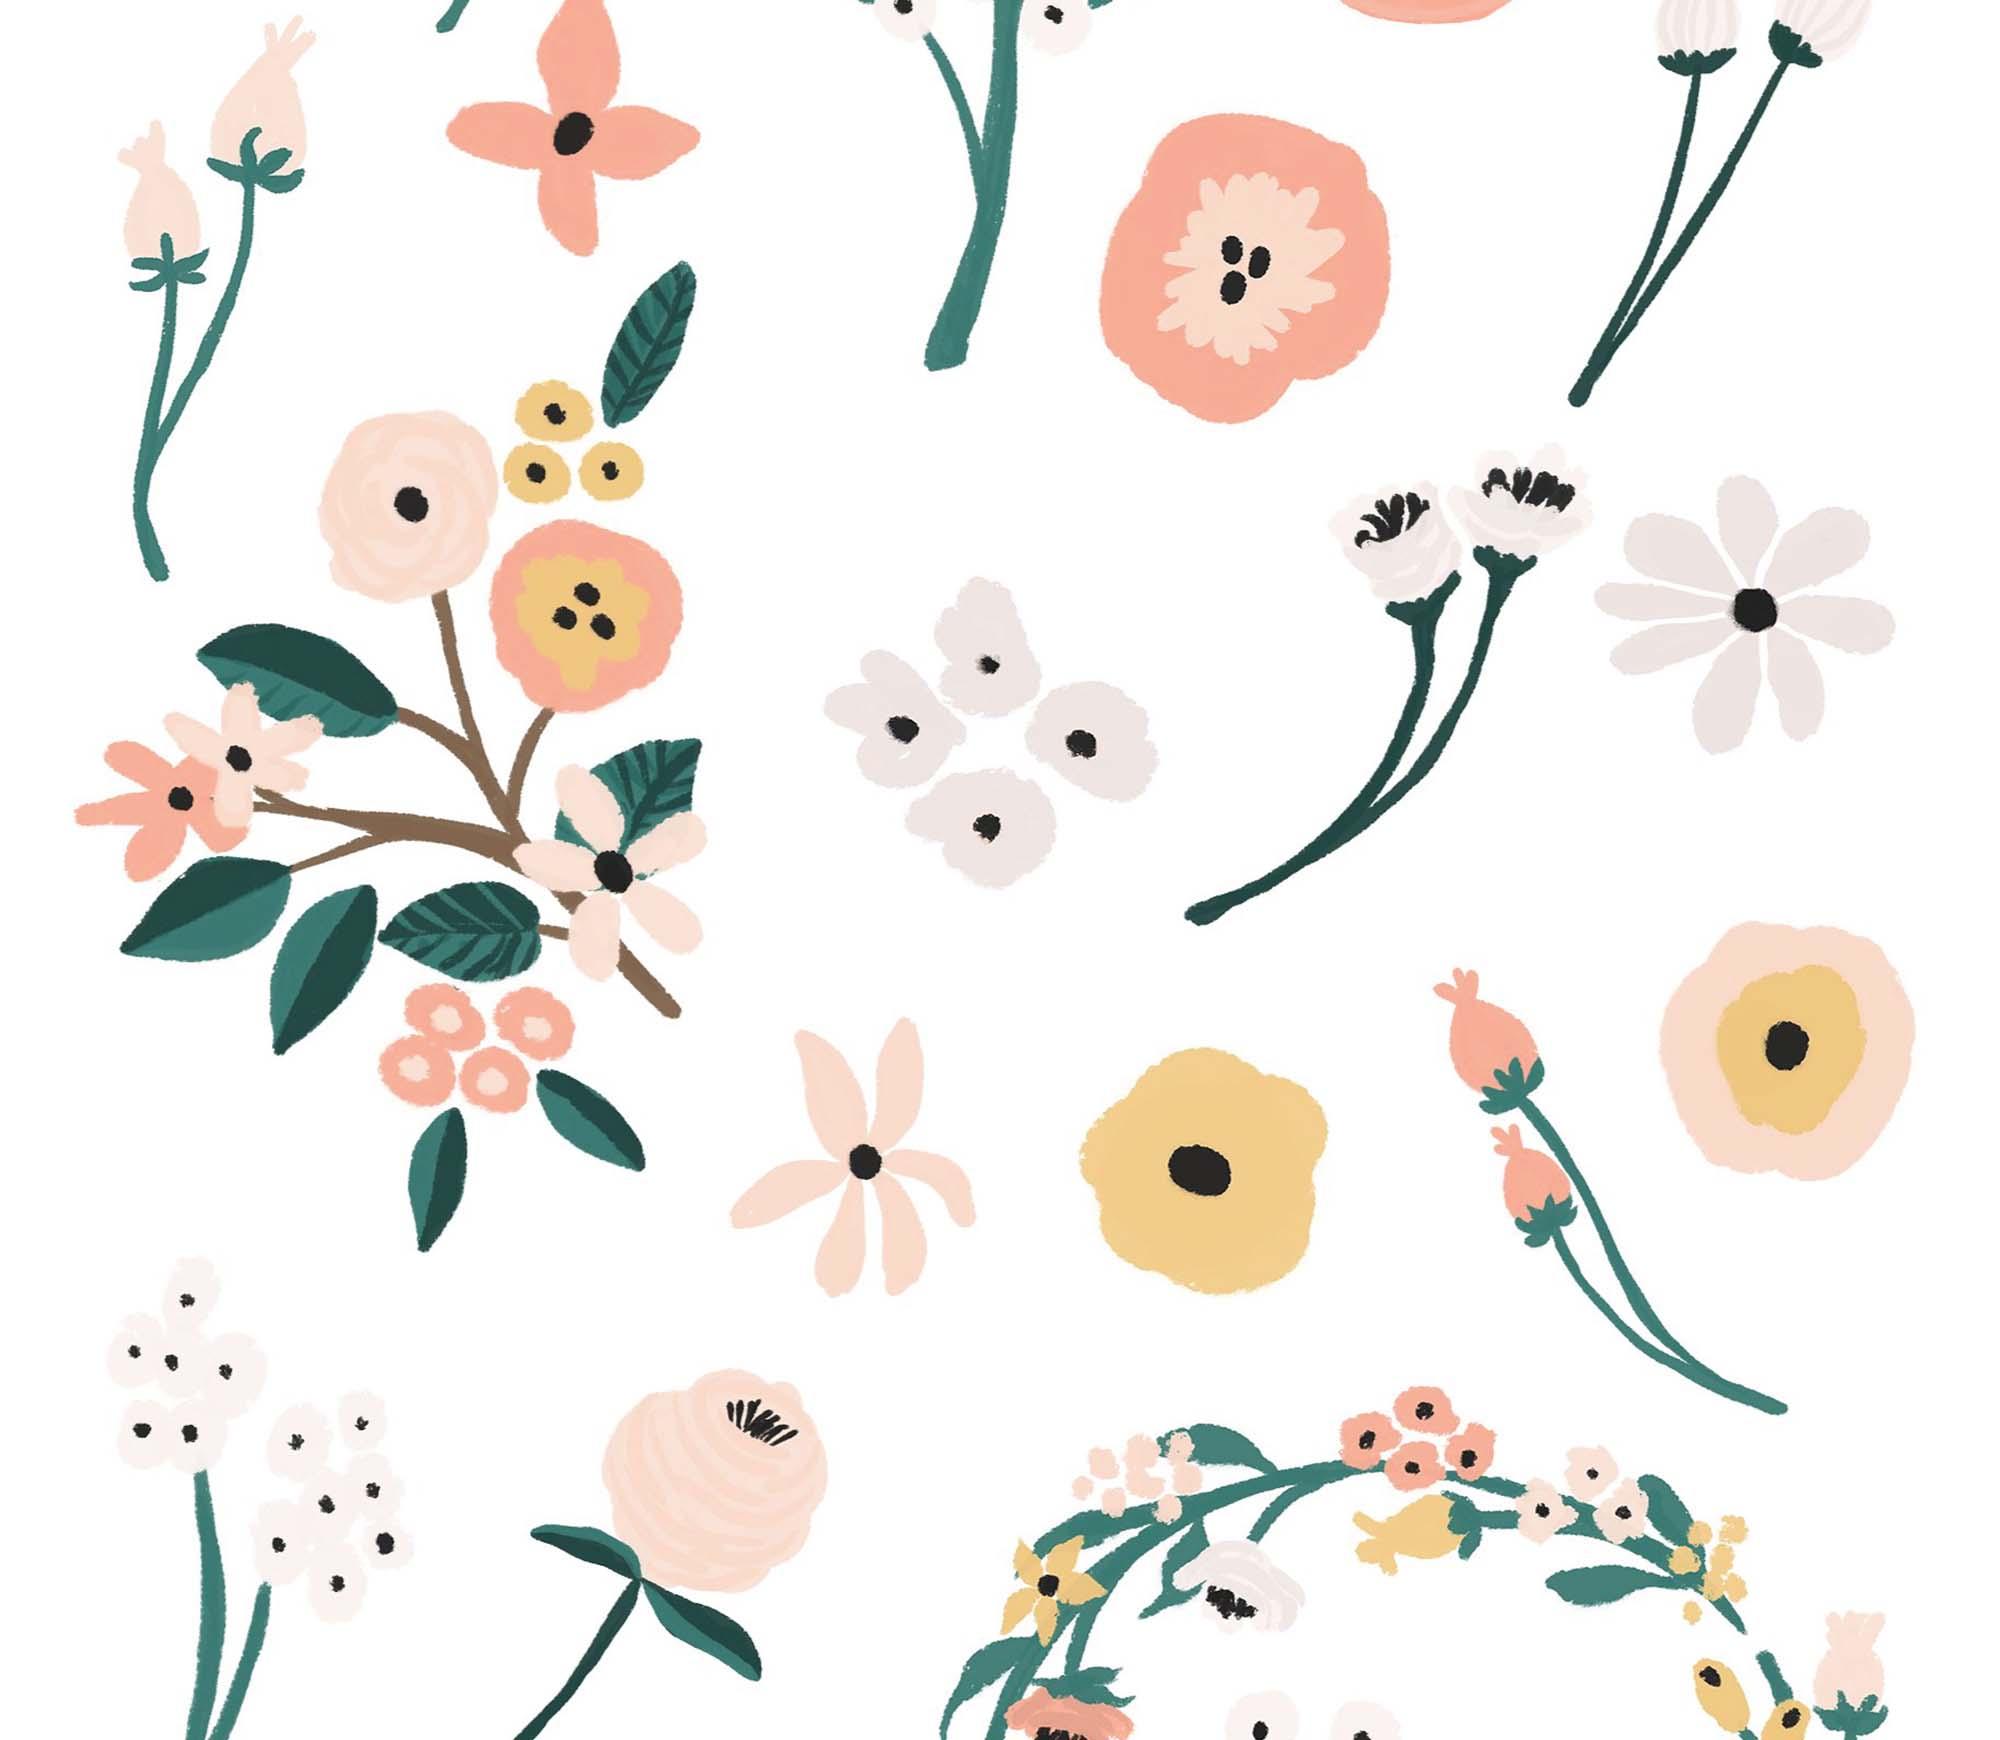 Lillia Floral Illustrations 5